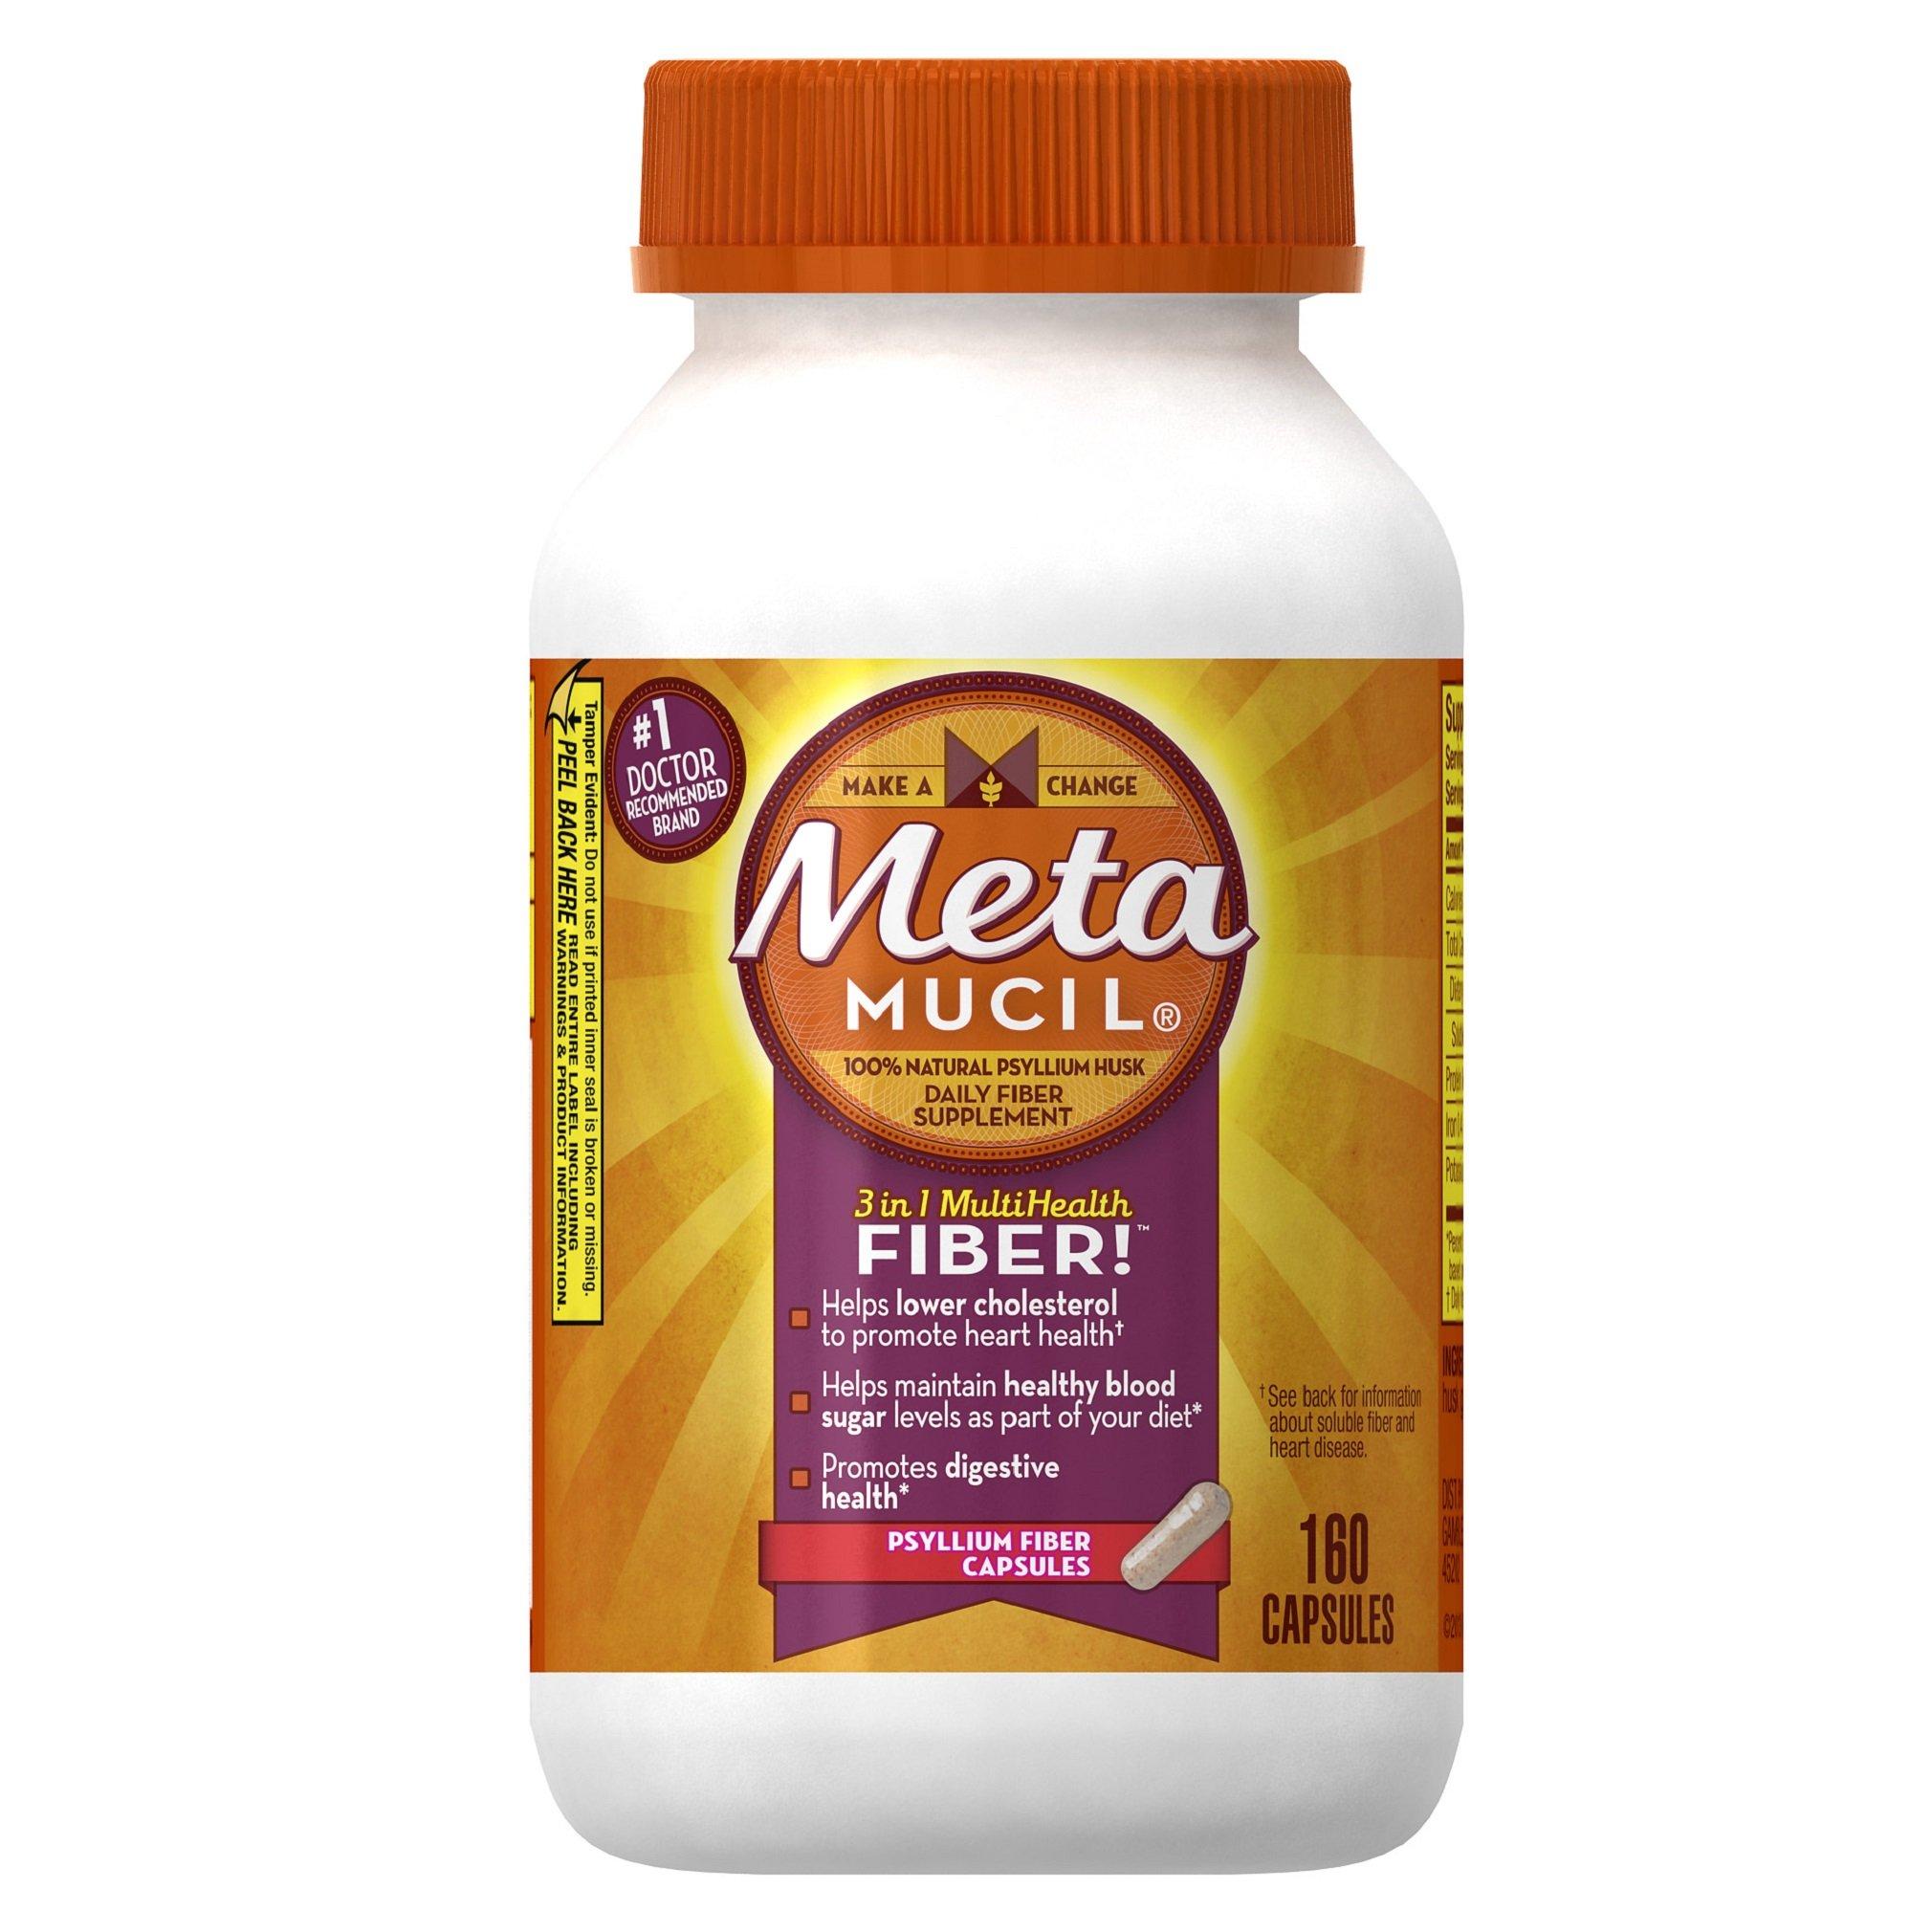 Metamucil Daily Fiber Supplement, Psyllium Husk Capsules, 160 Capsules (Pack of 2)